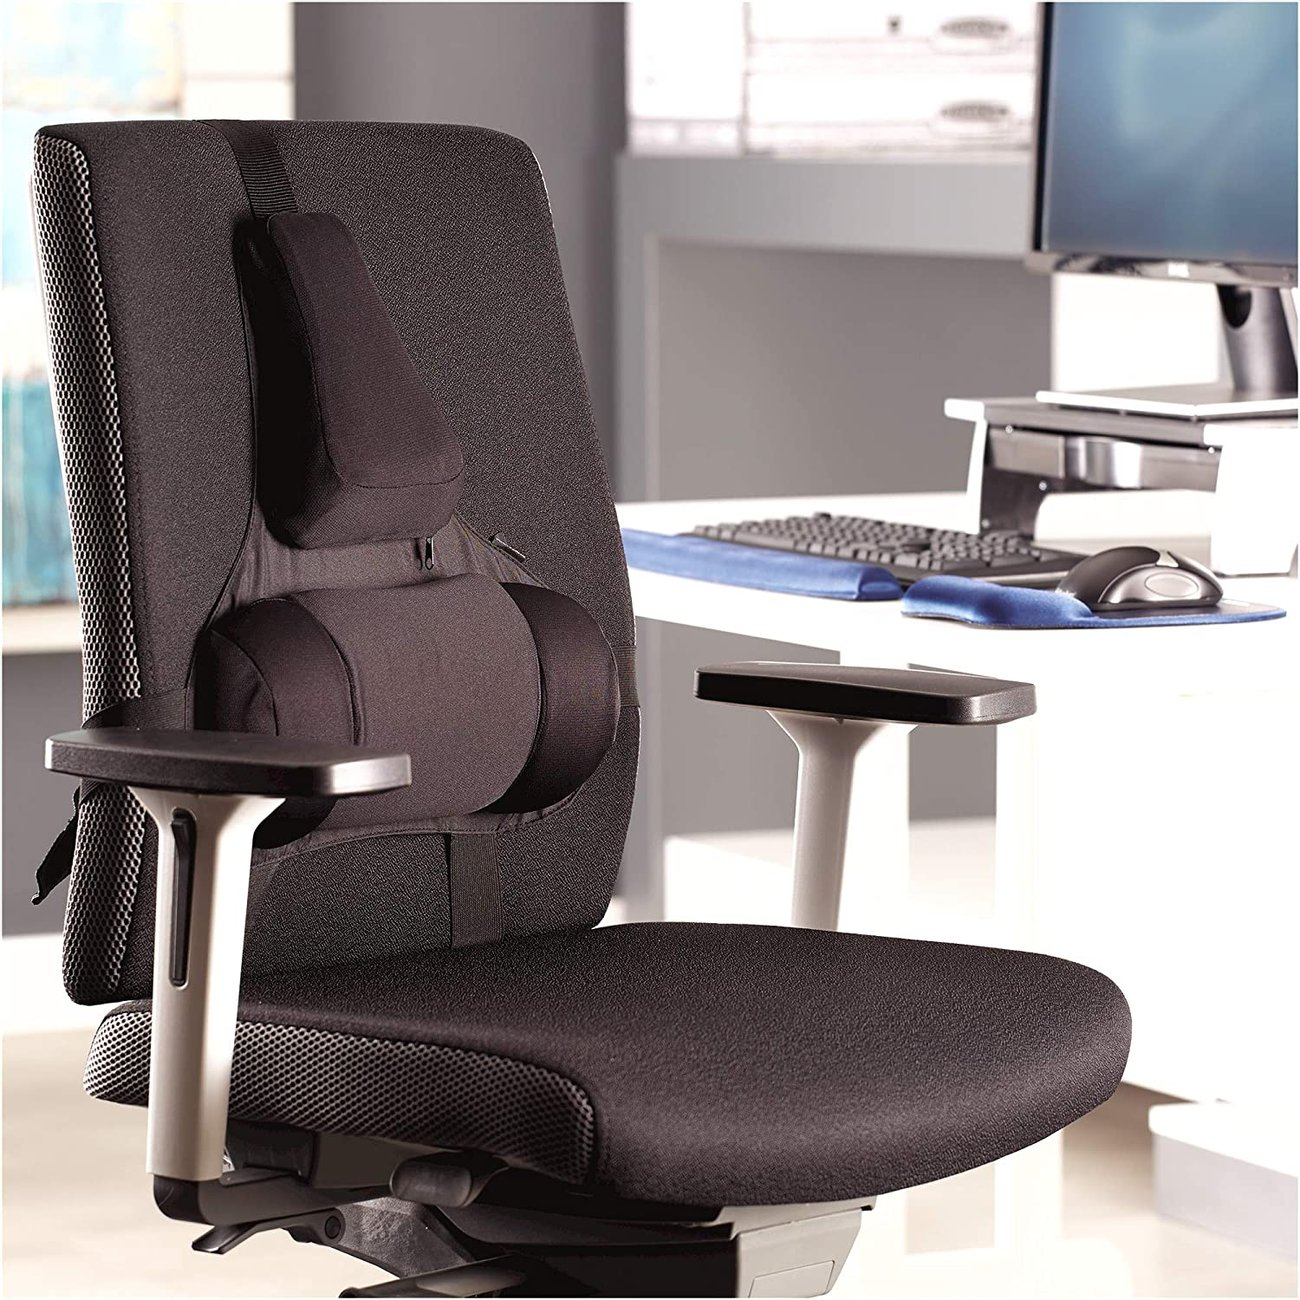 Облегалка за стол Fellowes Professional Series Ultimate Support Black 8041801